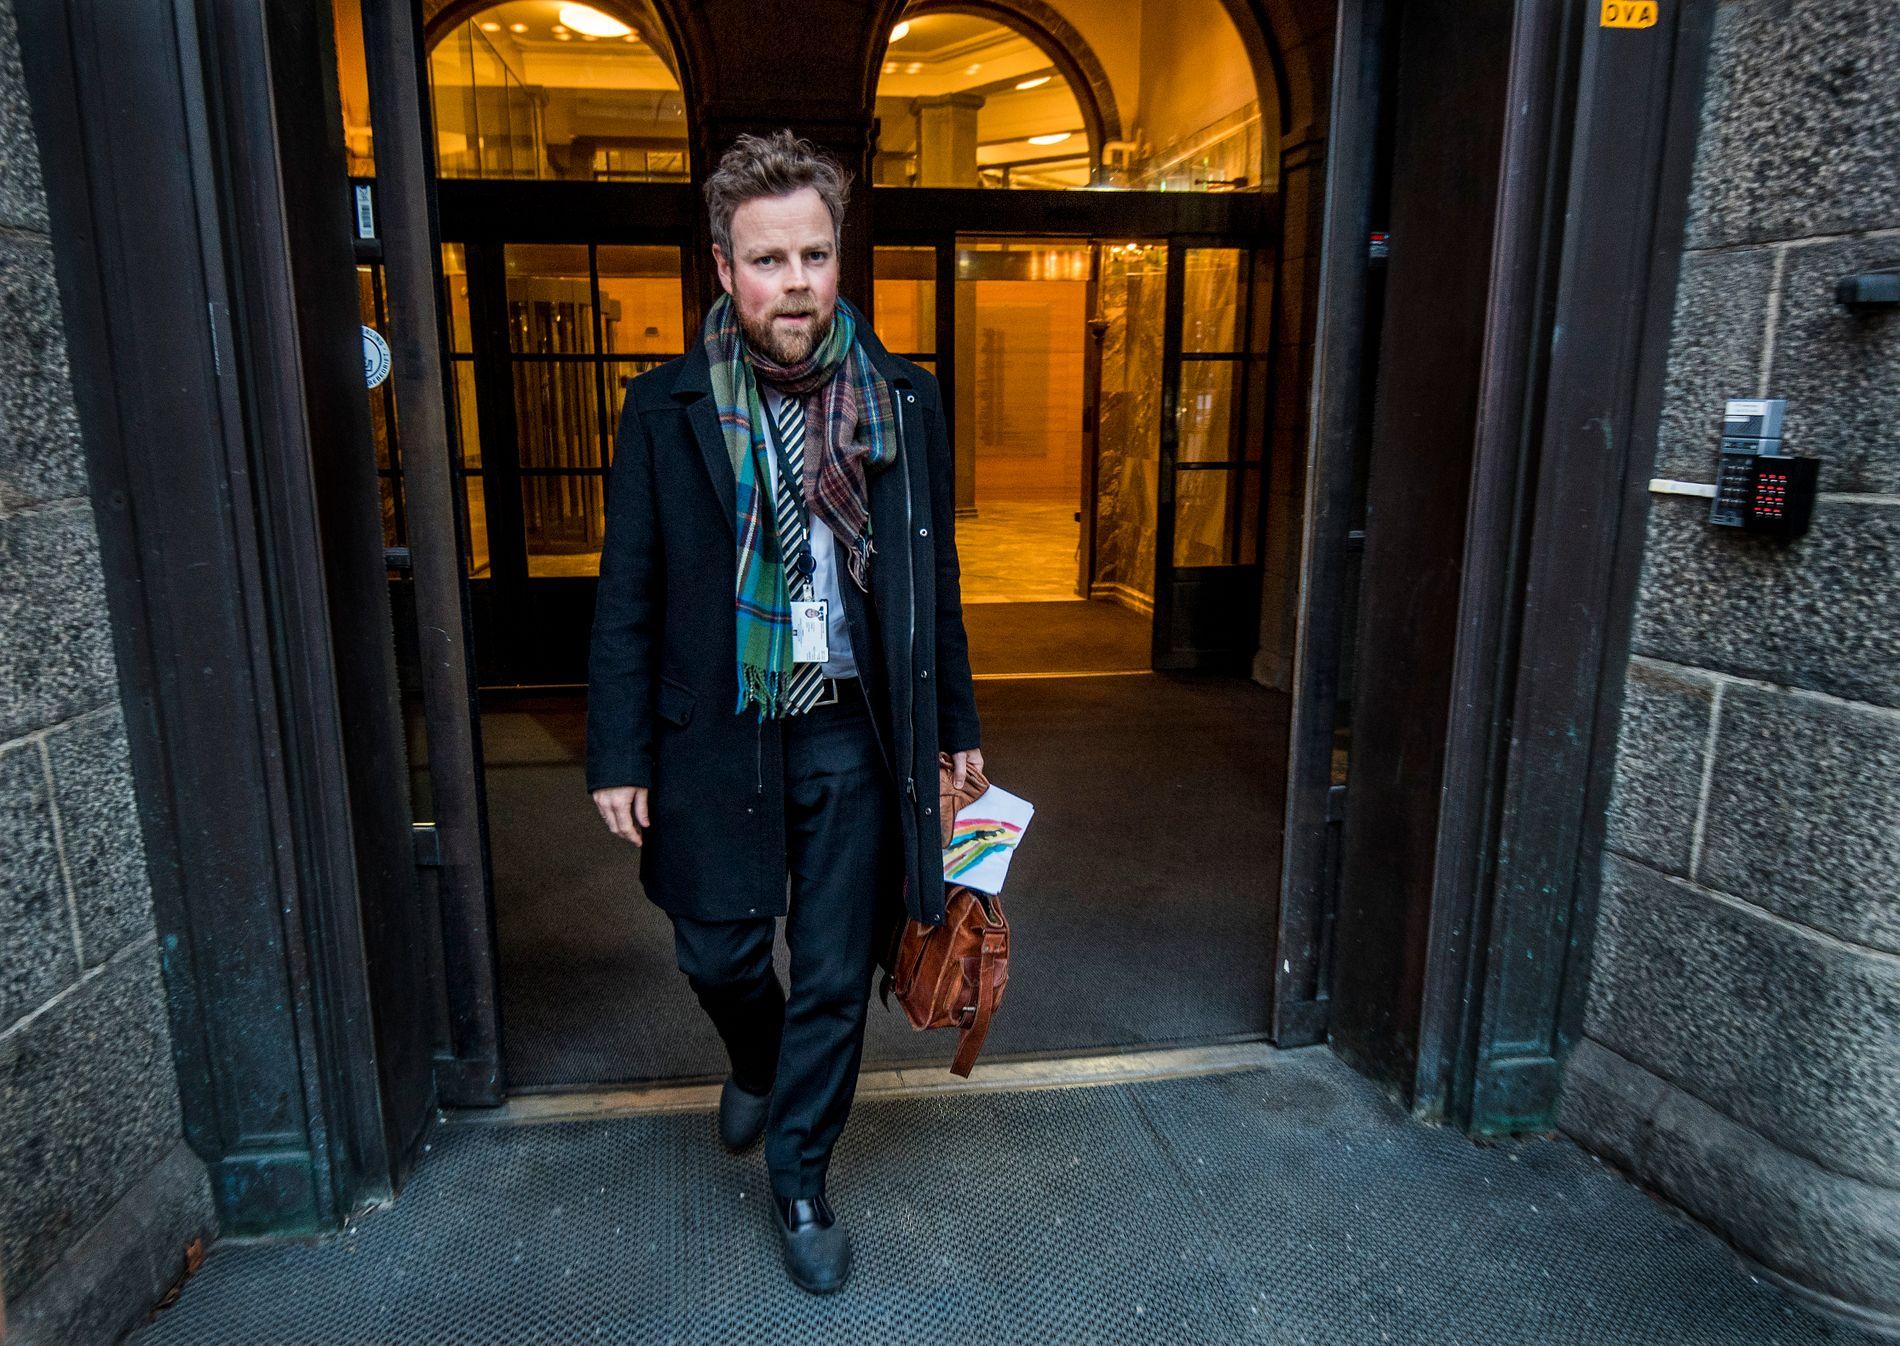 FREMSNAKKER KONGEN: Kunnskapsminister Torbjørn Røe Isaksen er glad for at kongen minner både politikere og andre på at mobbing er et kontinuerlig problem. Her er statsråden på vei ut fra eget departement tidligere i vinter.